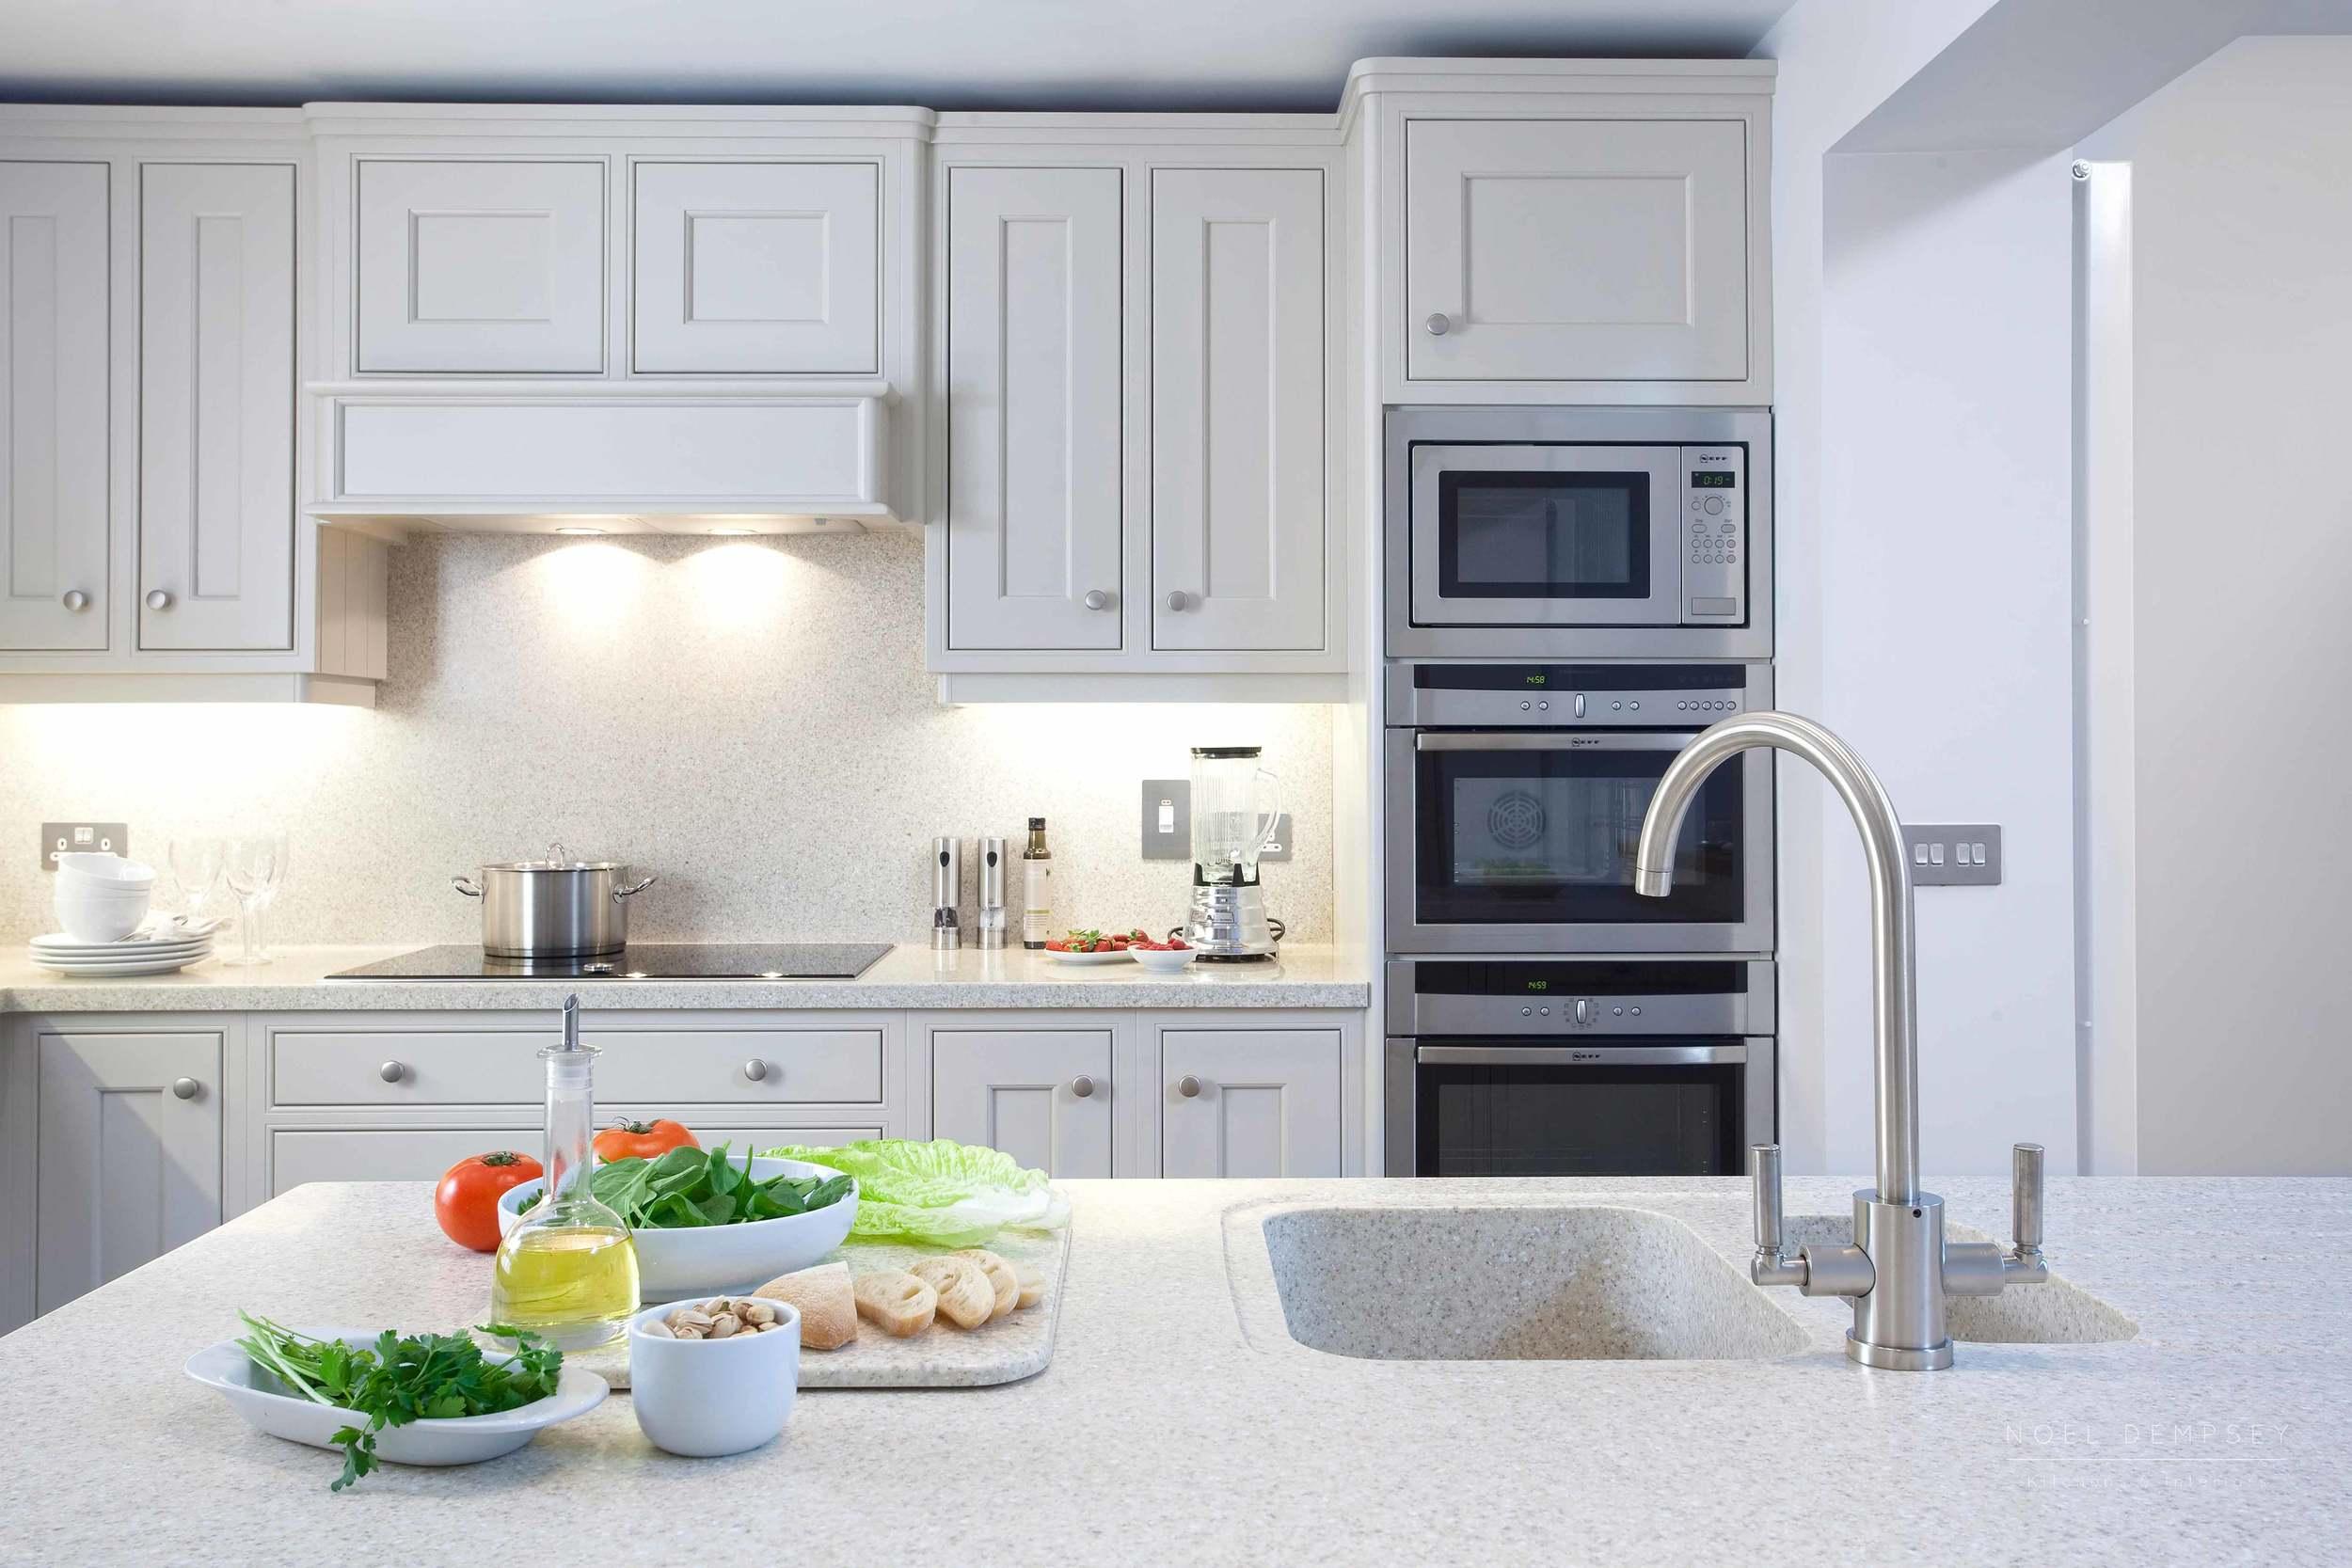 Blackrock-painted-kitchen-dublin-4.jpg